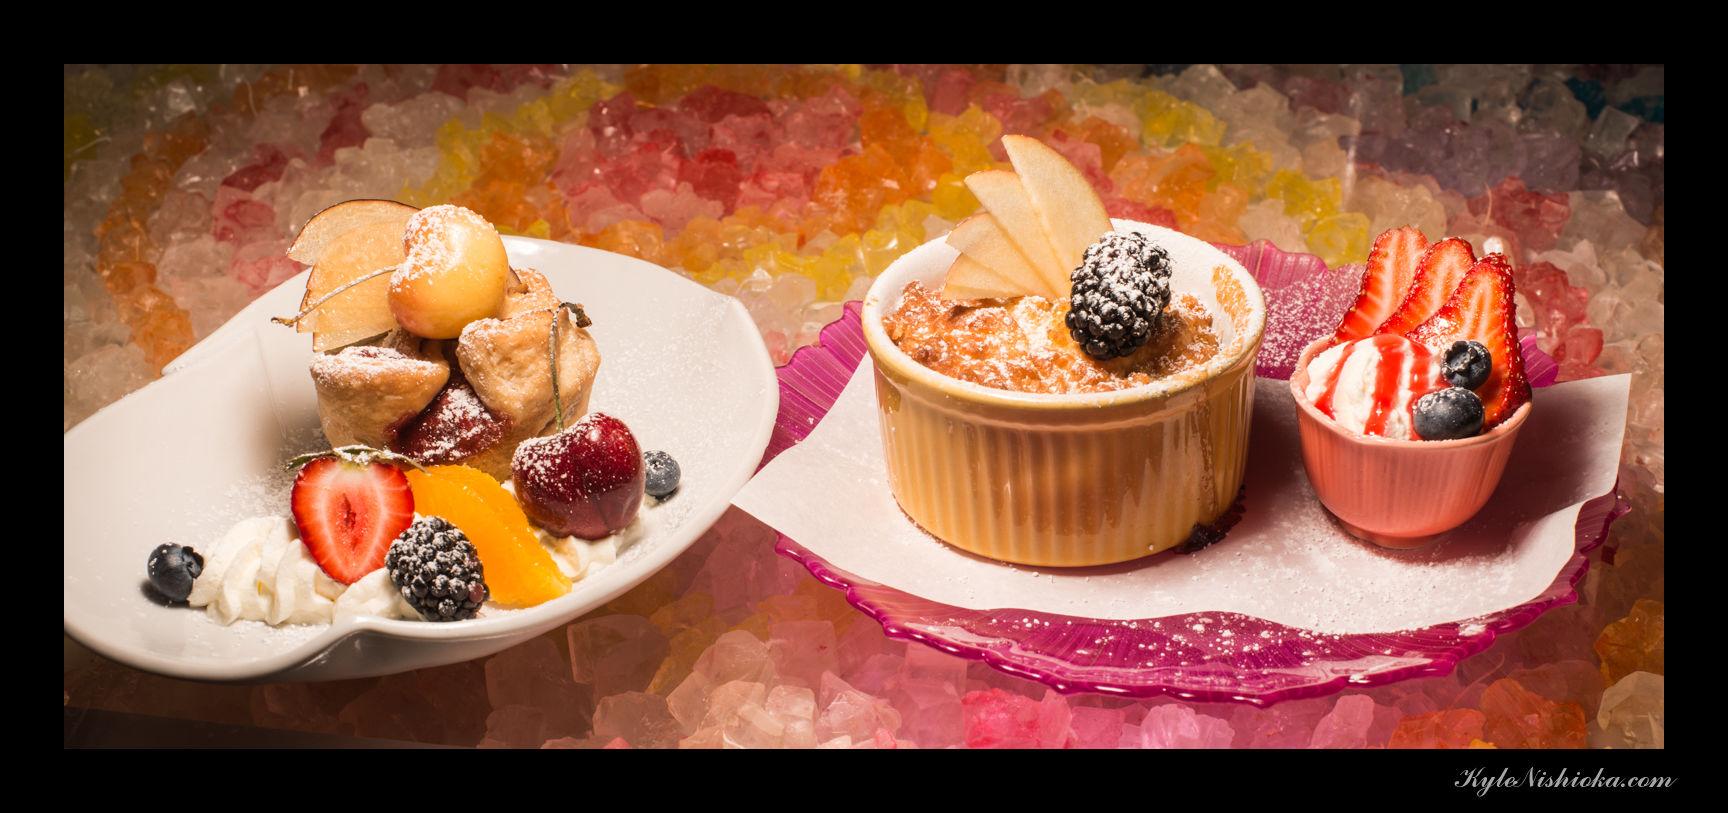 Plum & Cherry Cup Pie / Peach Cobbler